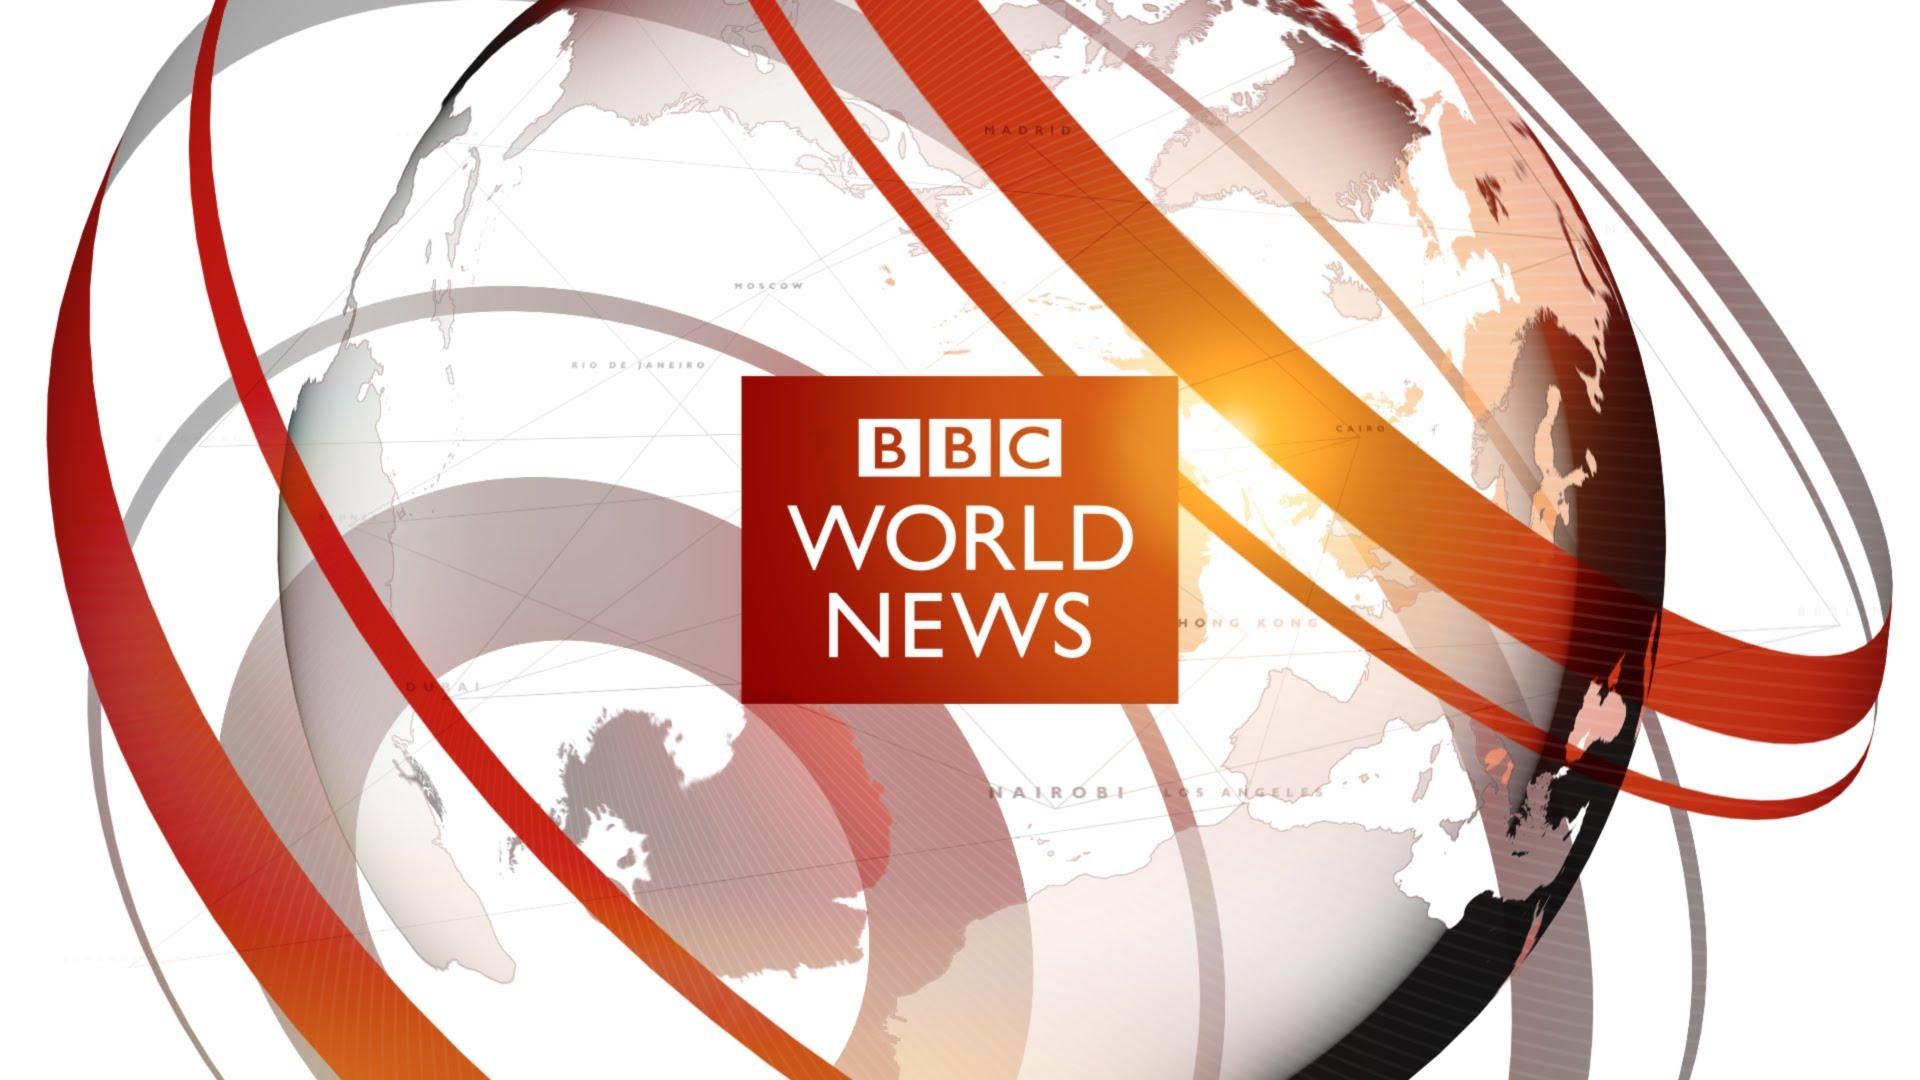 bbc-news-aland-ielts